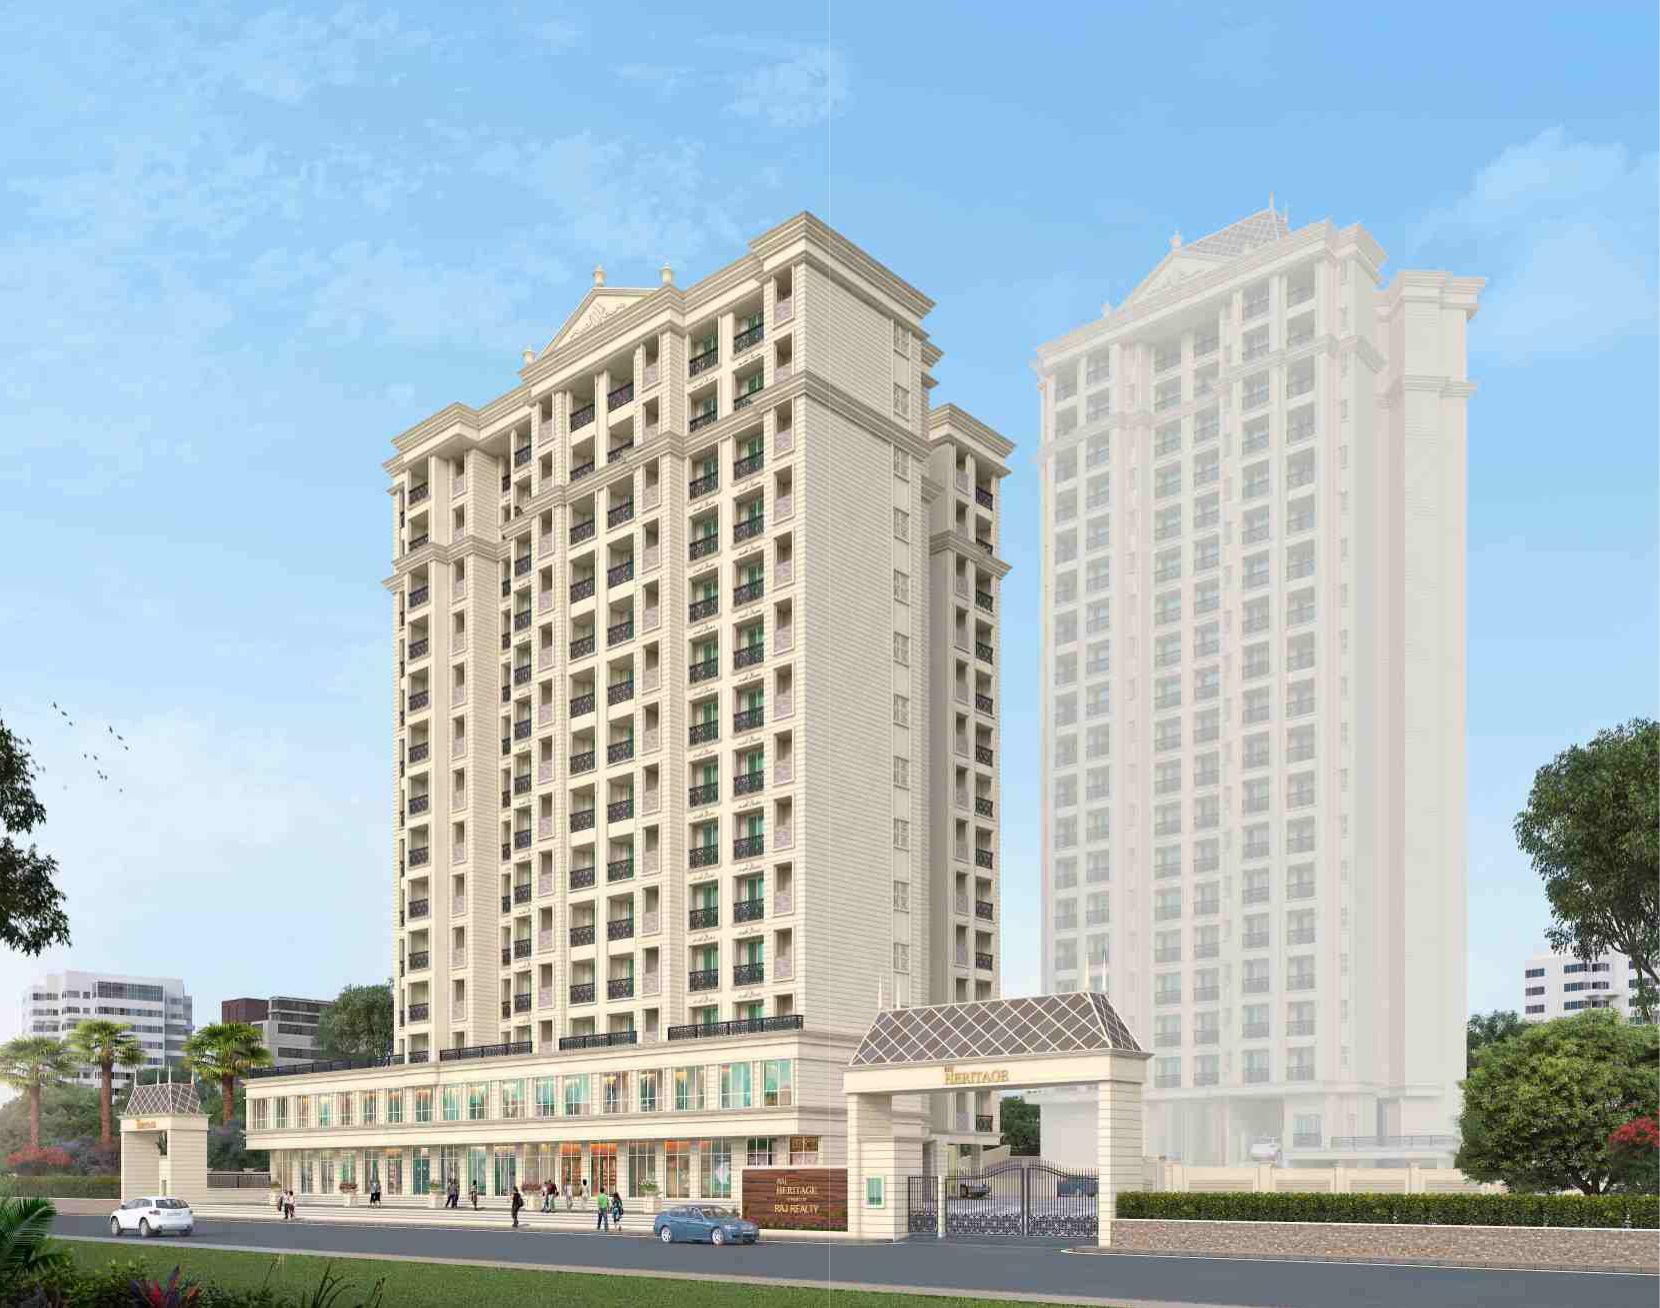 1 & 2 BHK Flats & Shops in Mira Road East in Raj Heritage 1